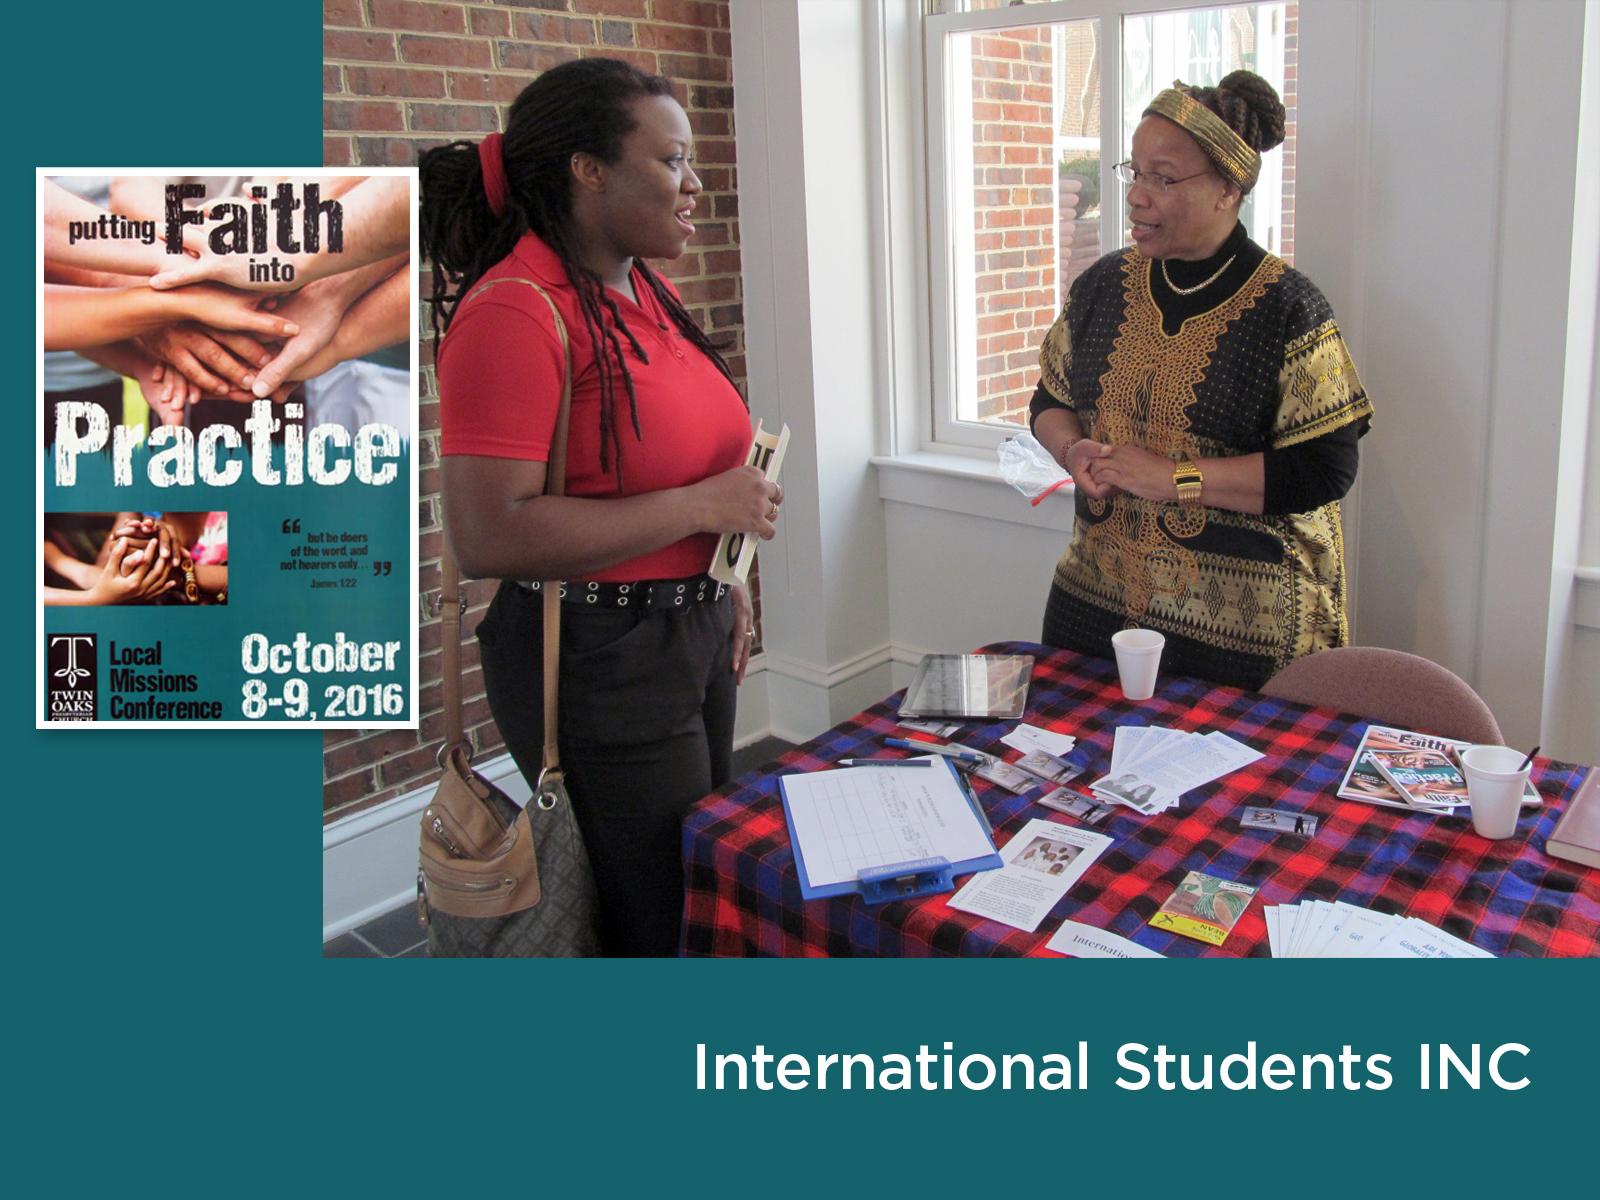 International Students INC 1.jpg